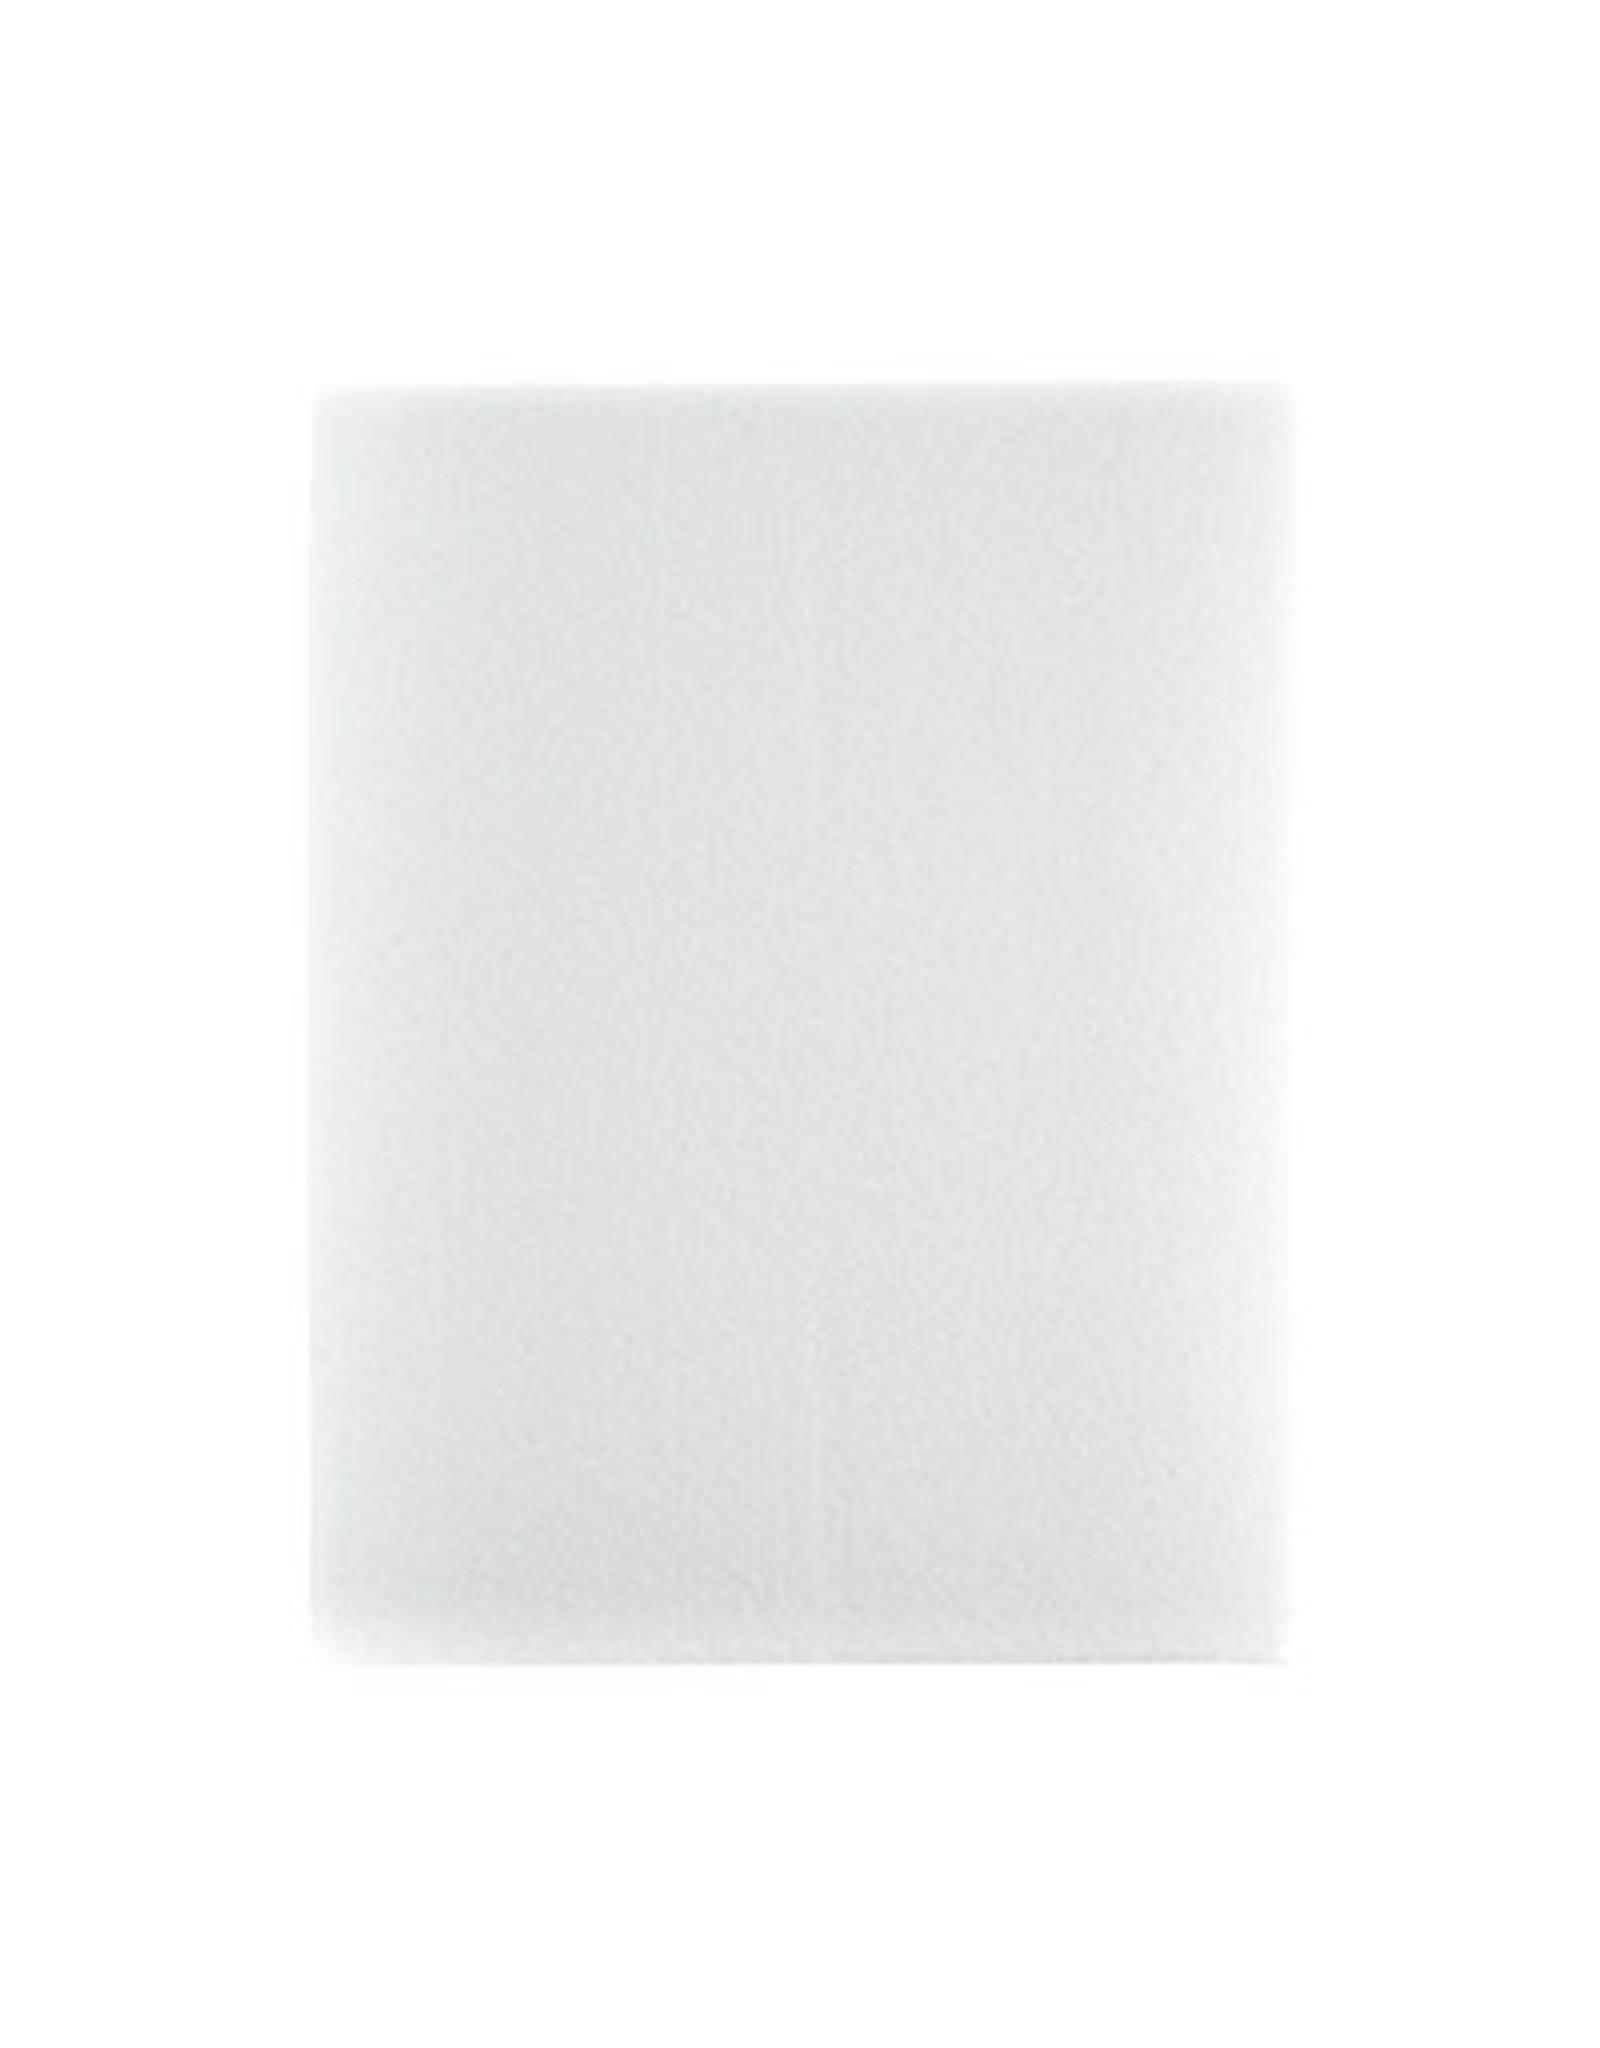 "Felt Beading Foundation White 1.5mm thick 8.5x11"""